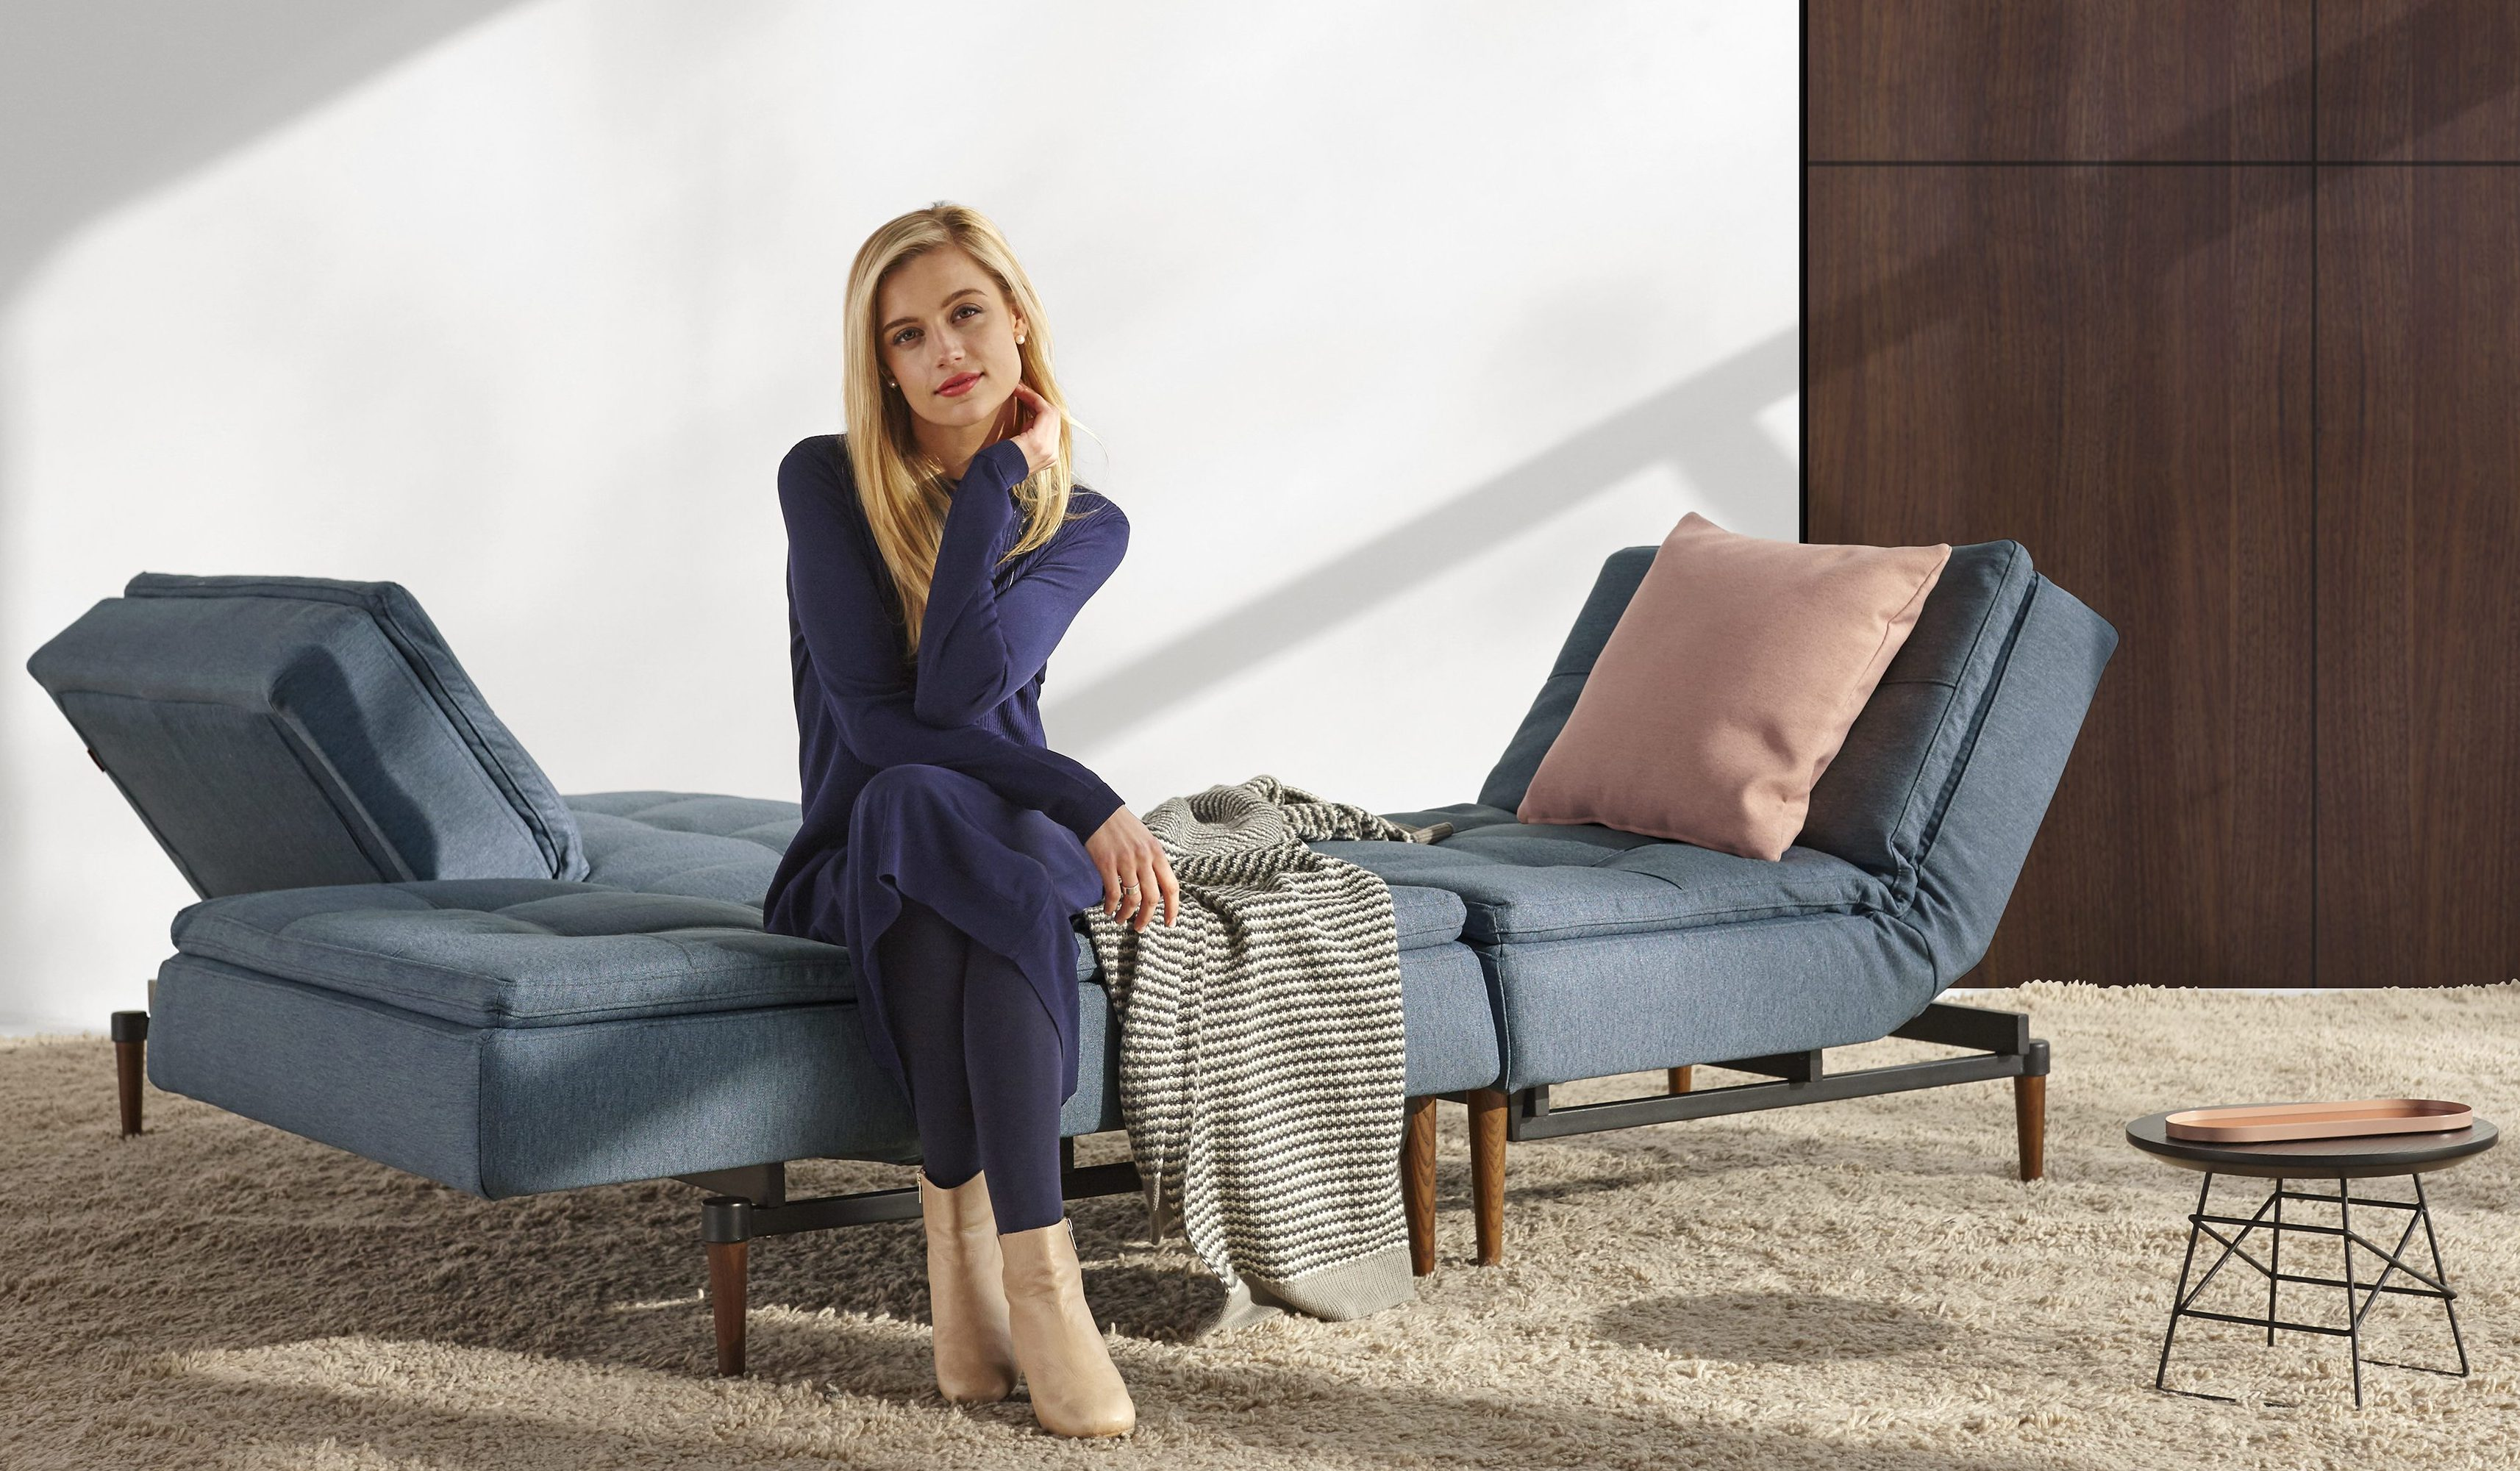 Dublexo-sofa-chairs-558-soft-indigo-dark-styletto-legs-1